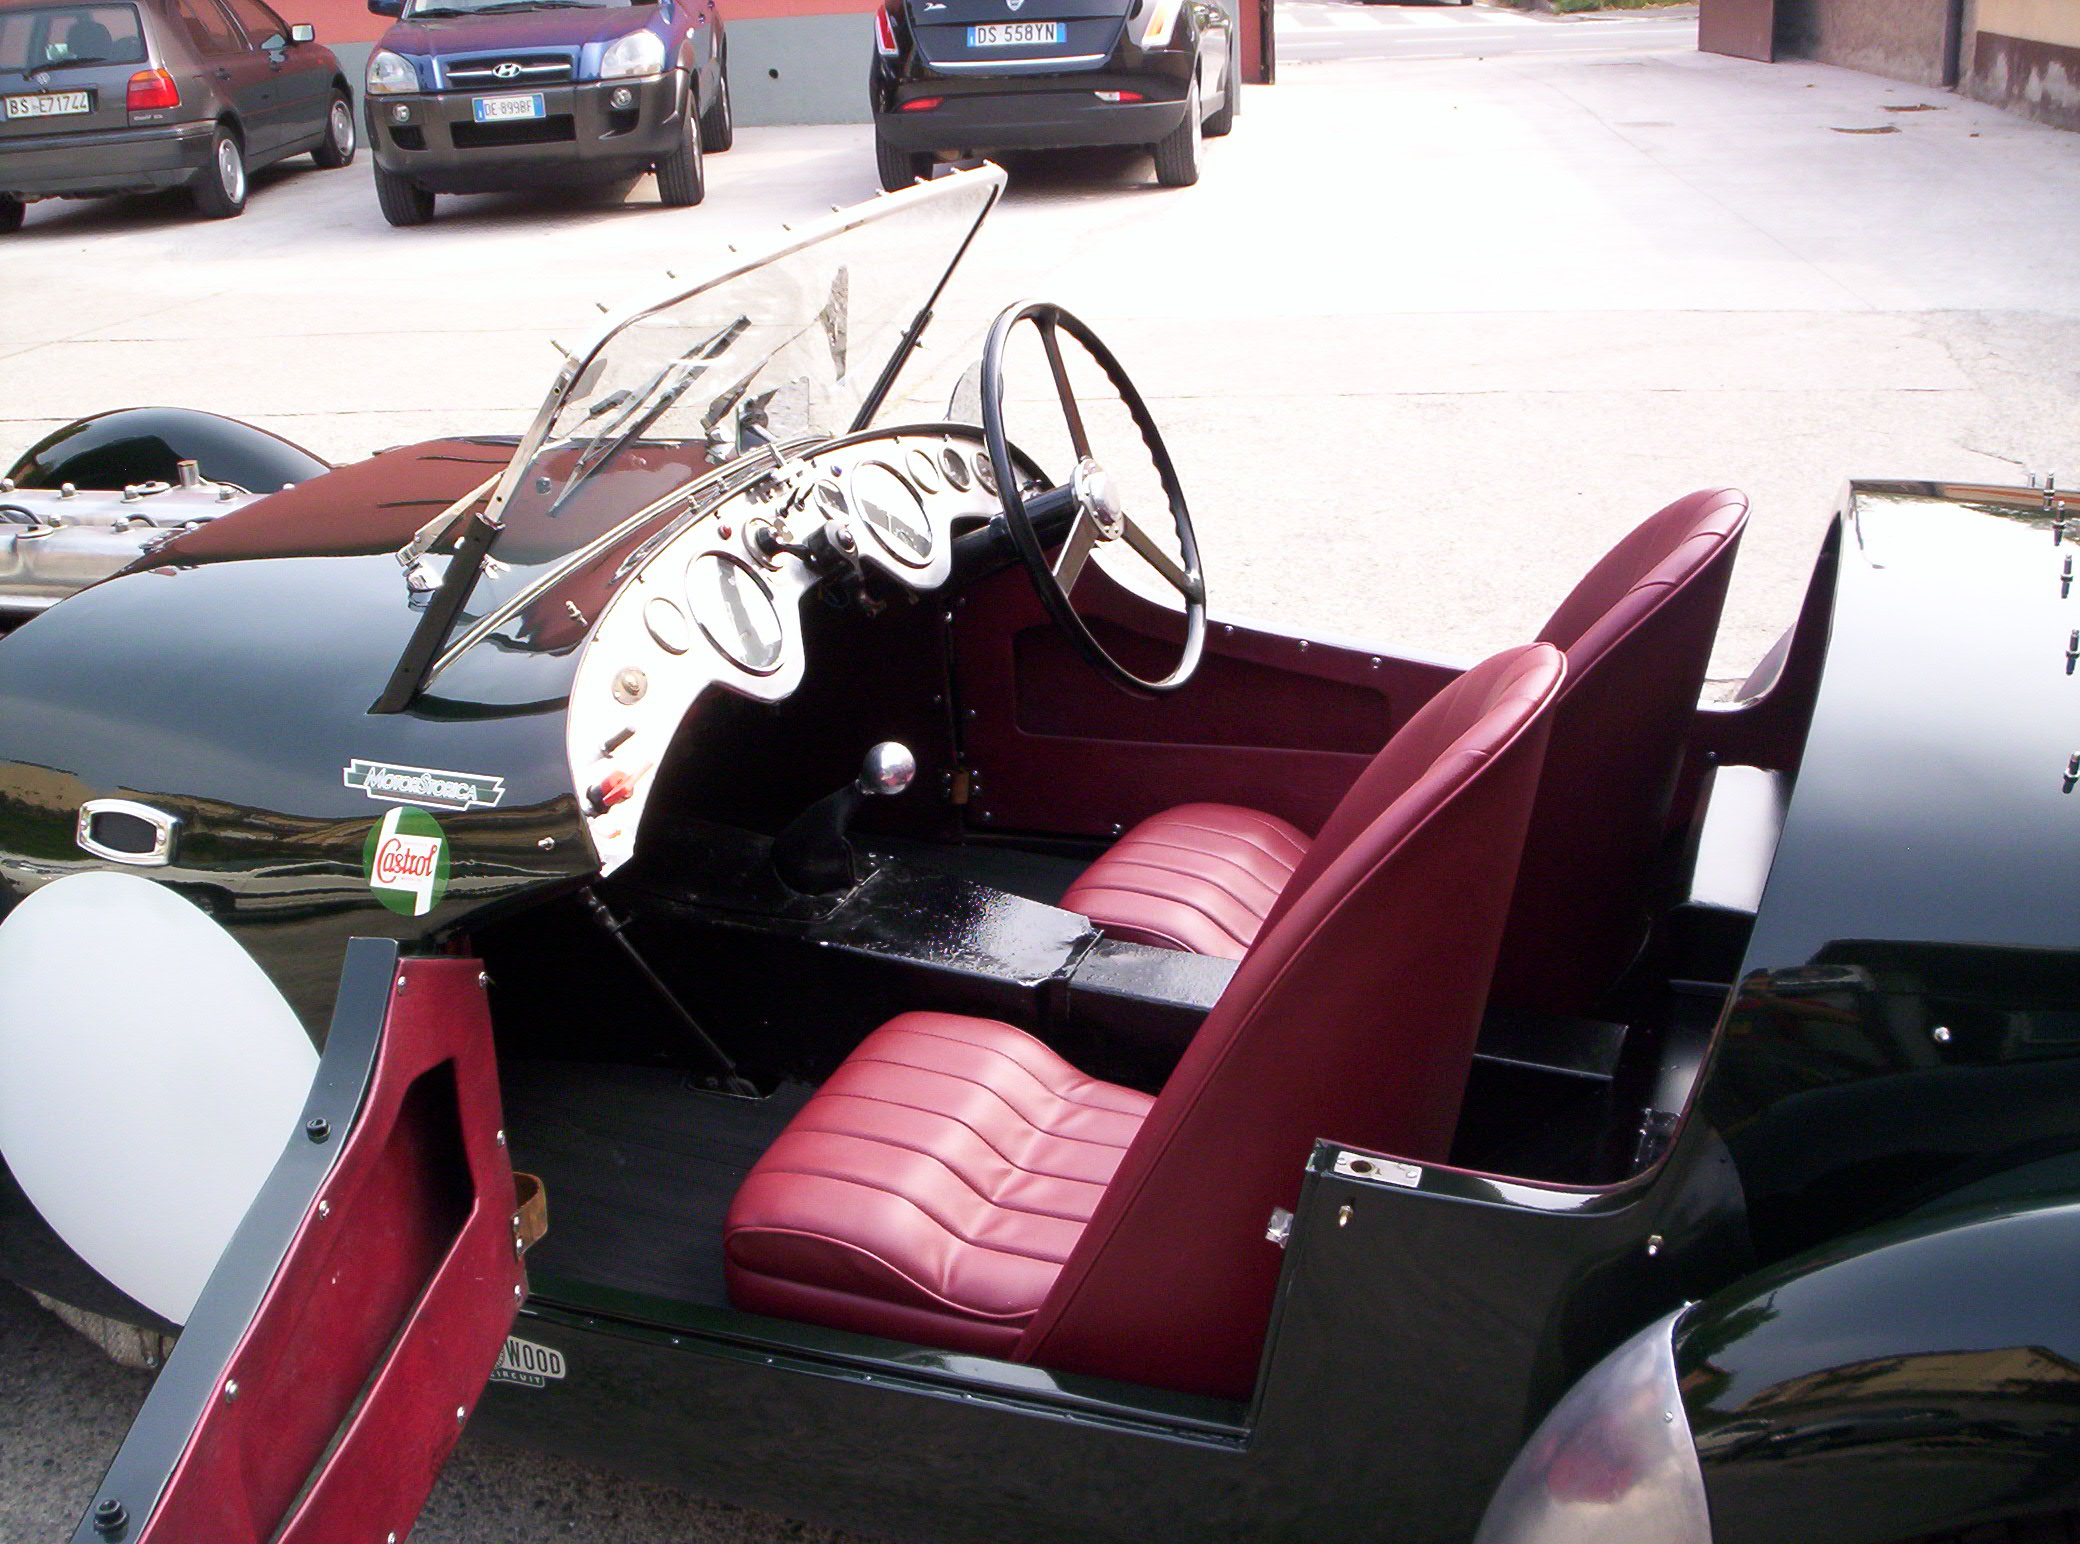 healey - carrozzeria brescia